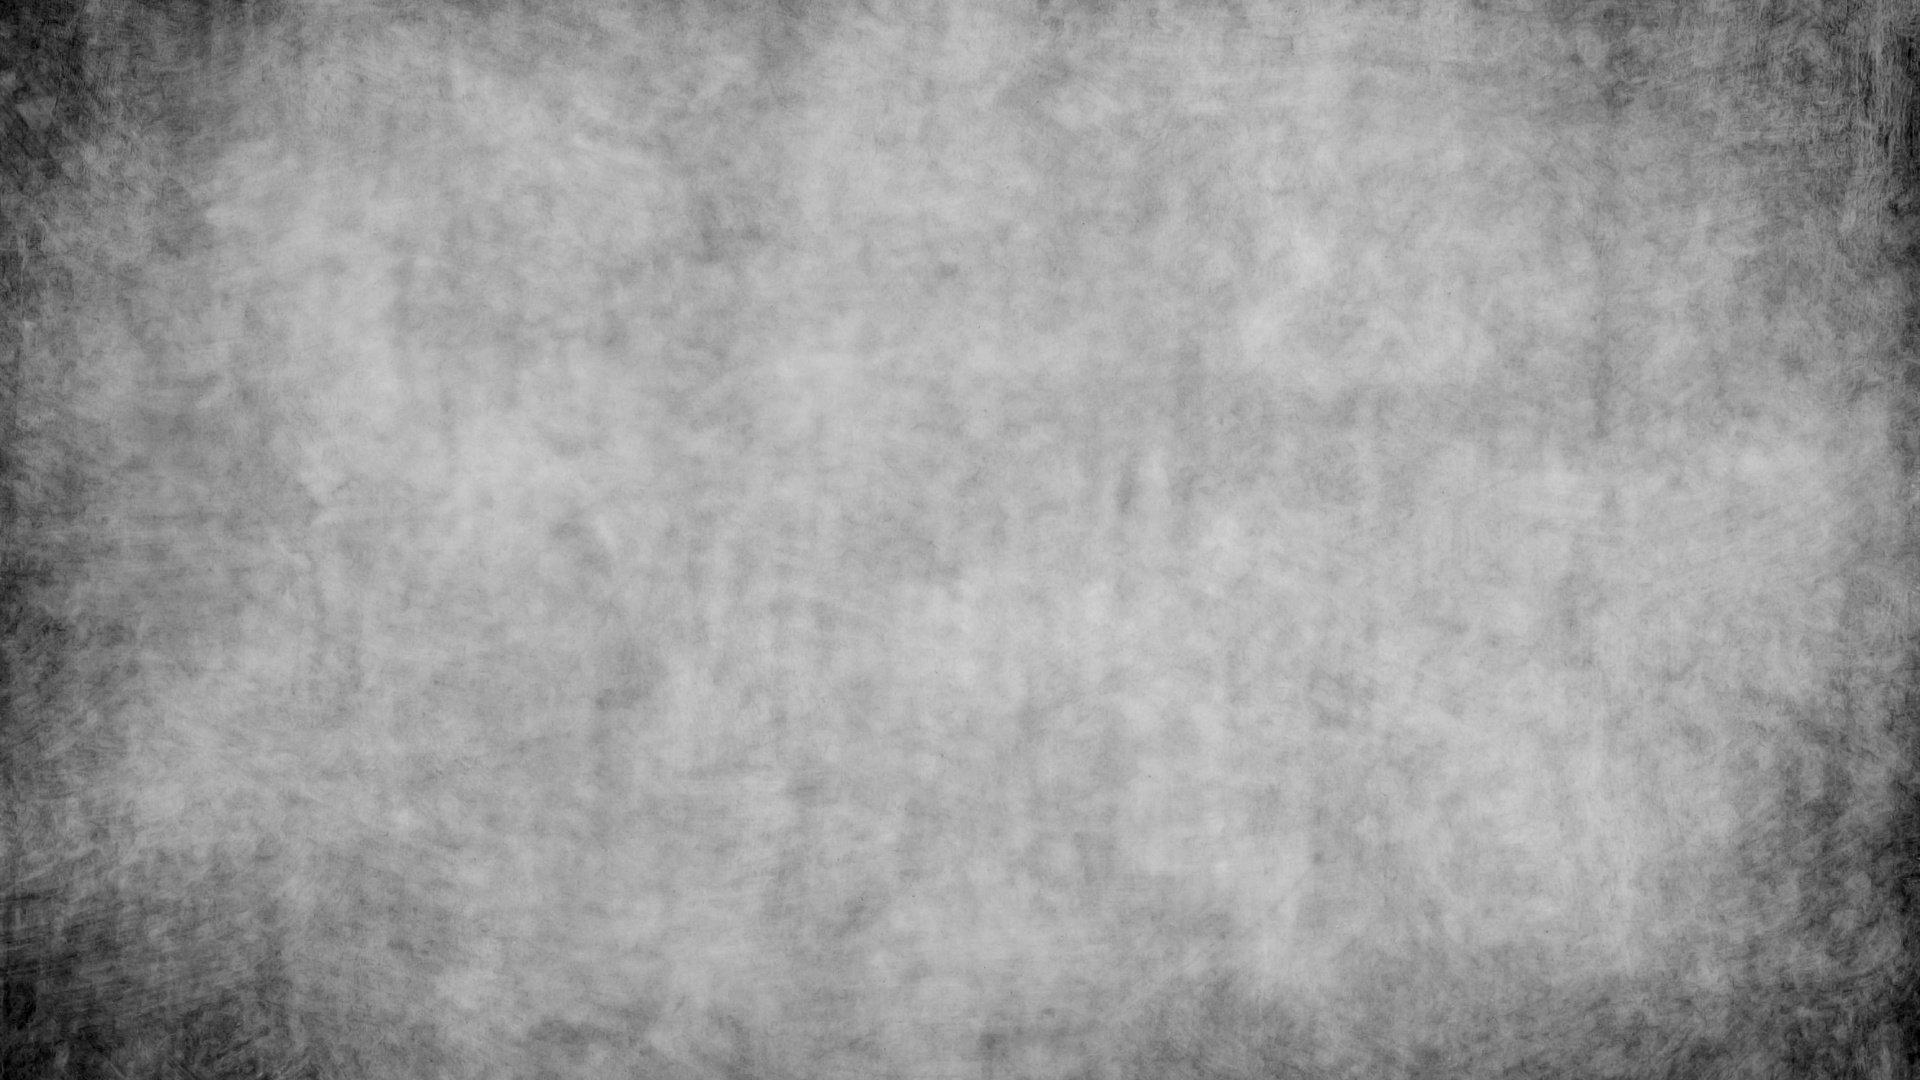 Grey Texture Background Hd